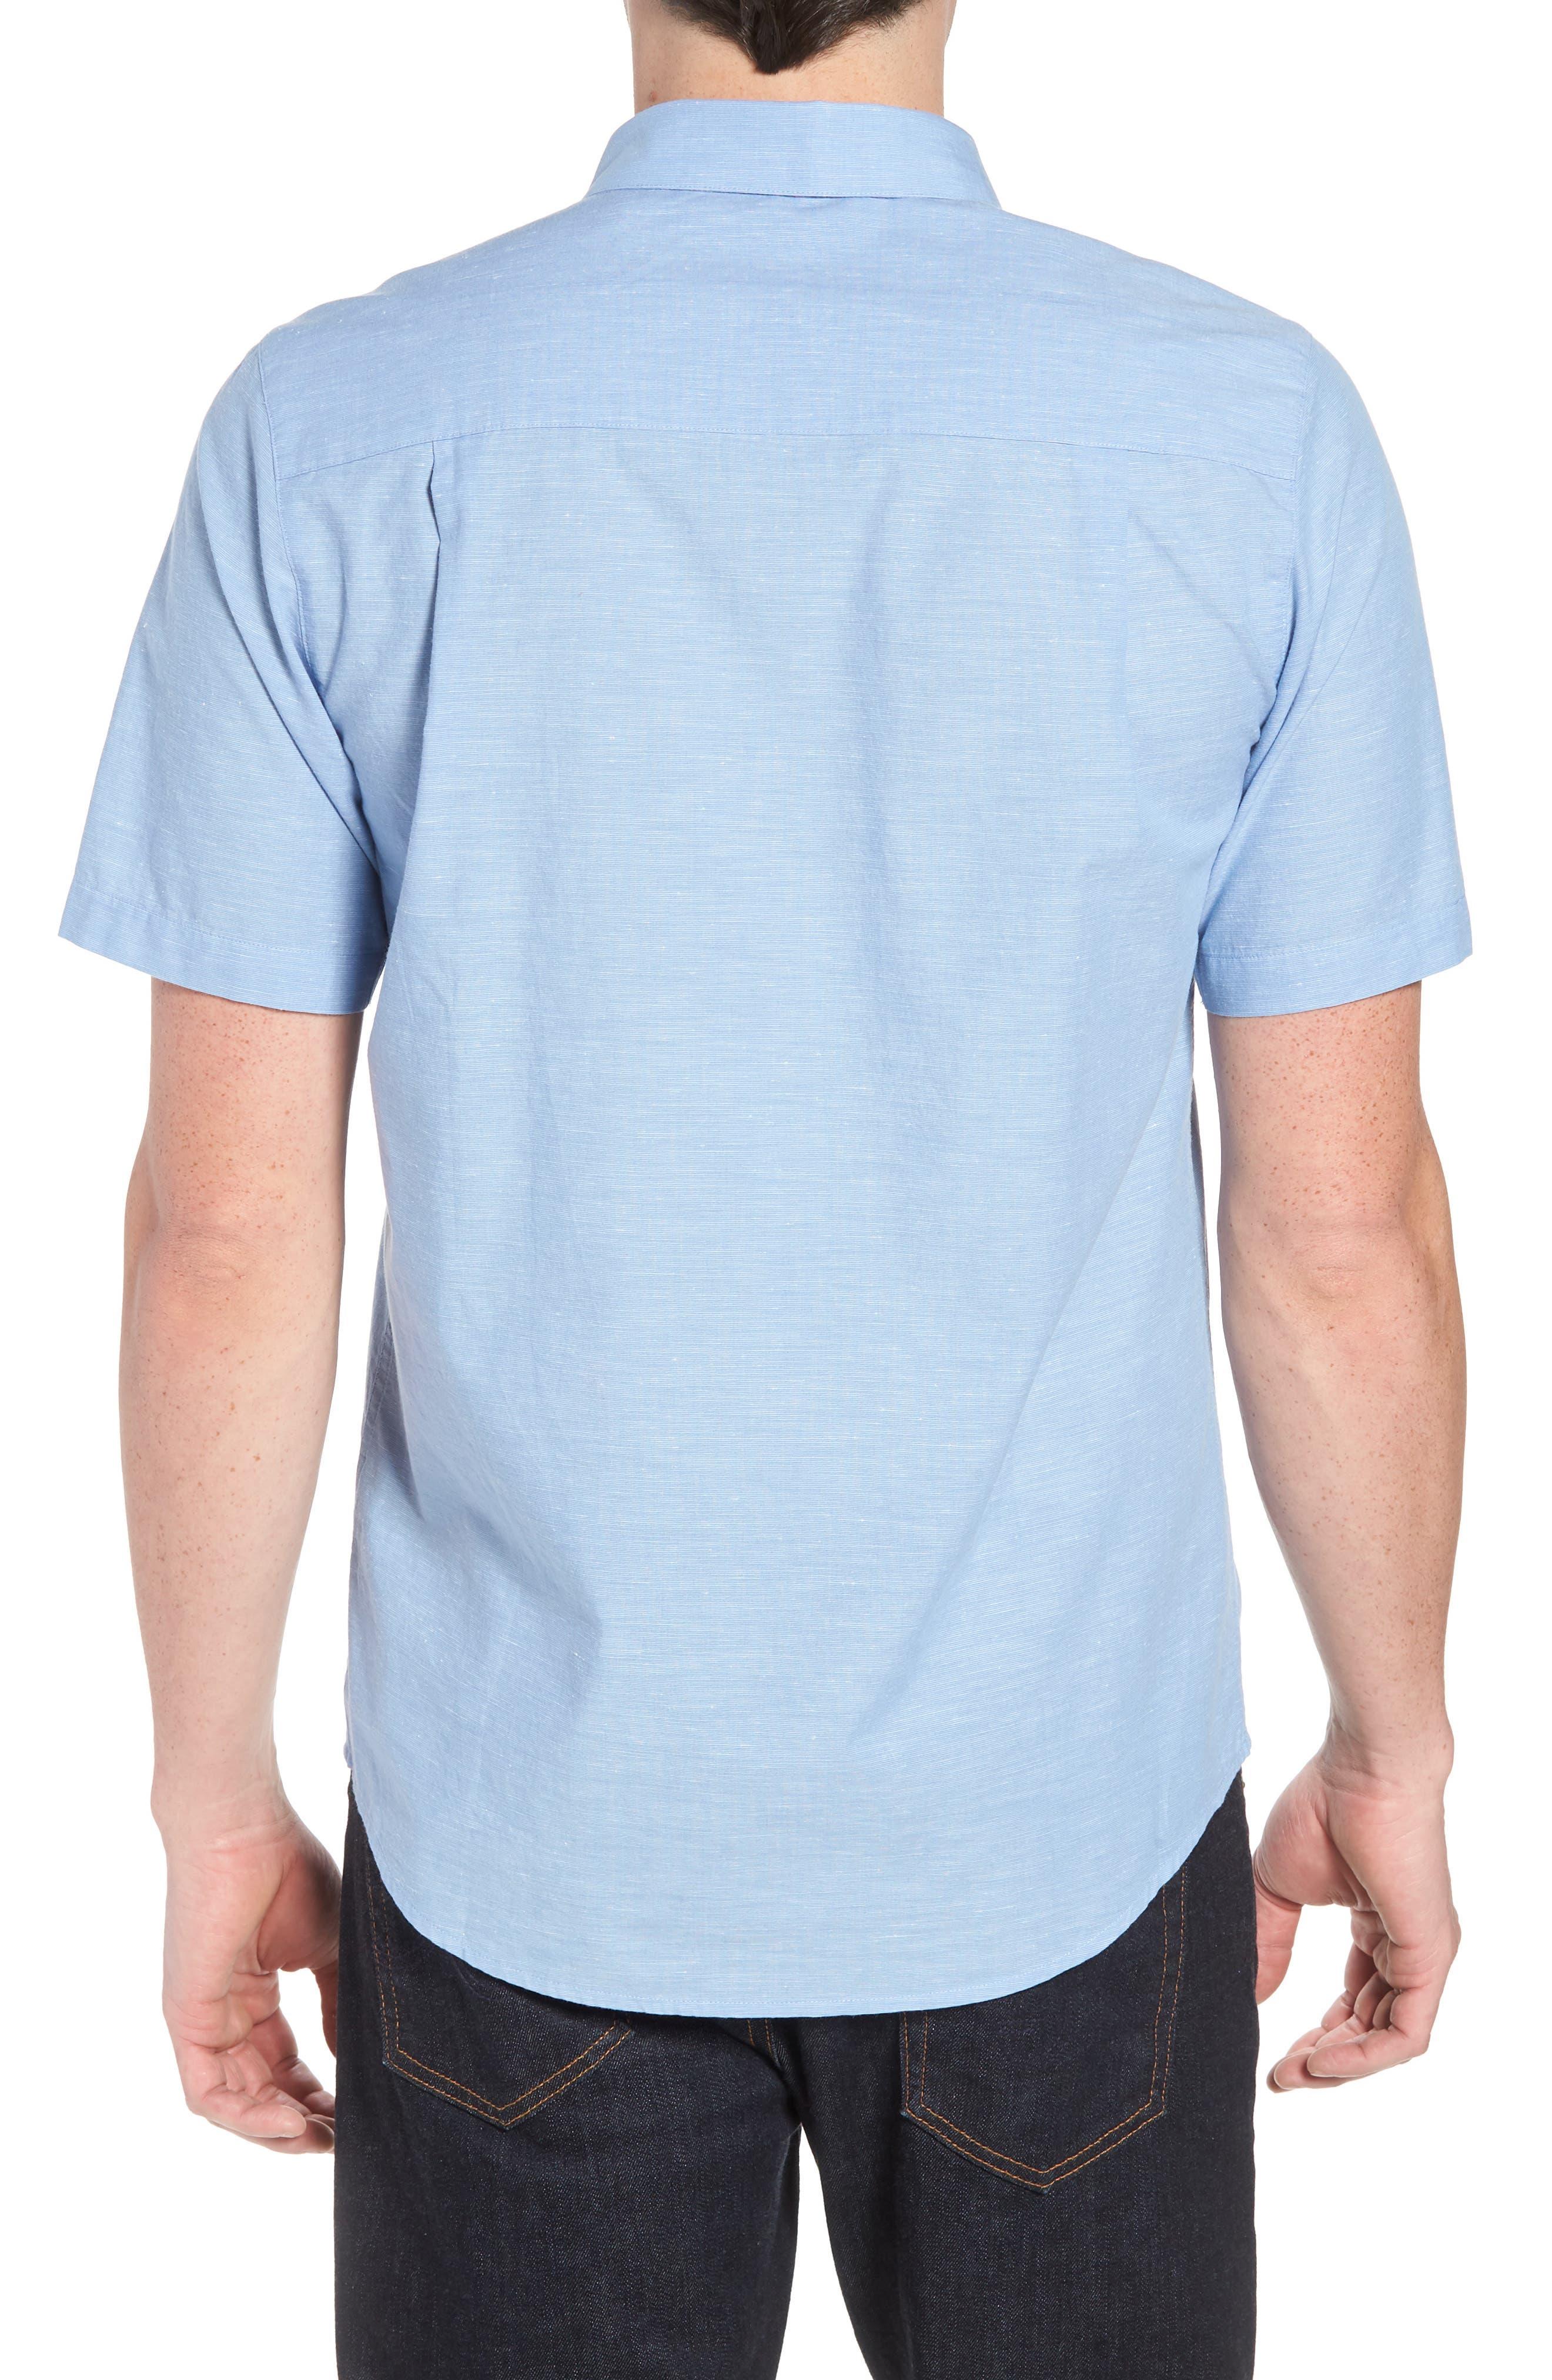 Canal Street Sport Shirt,                             Alternate thumbnail 3, color,                             Heather Allure